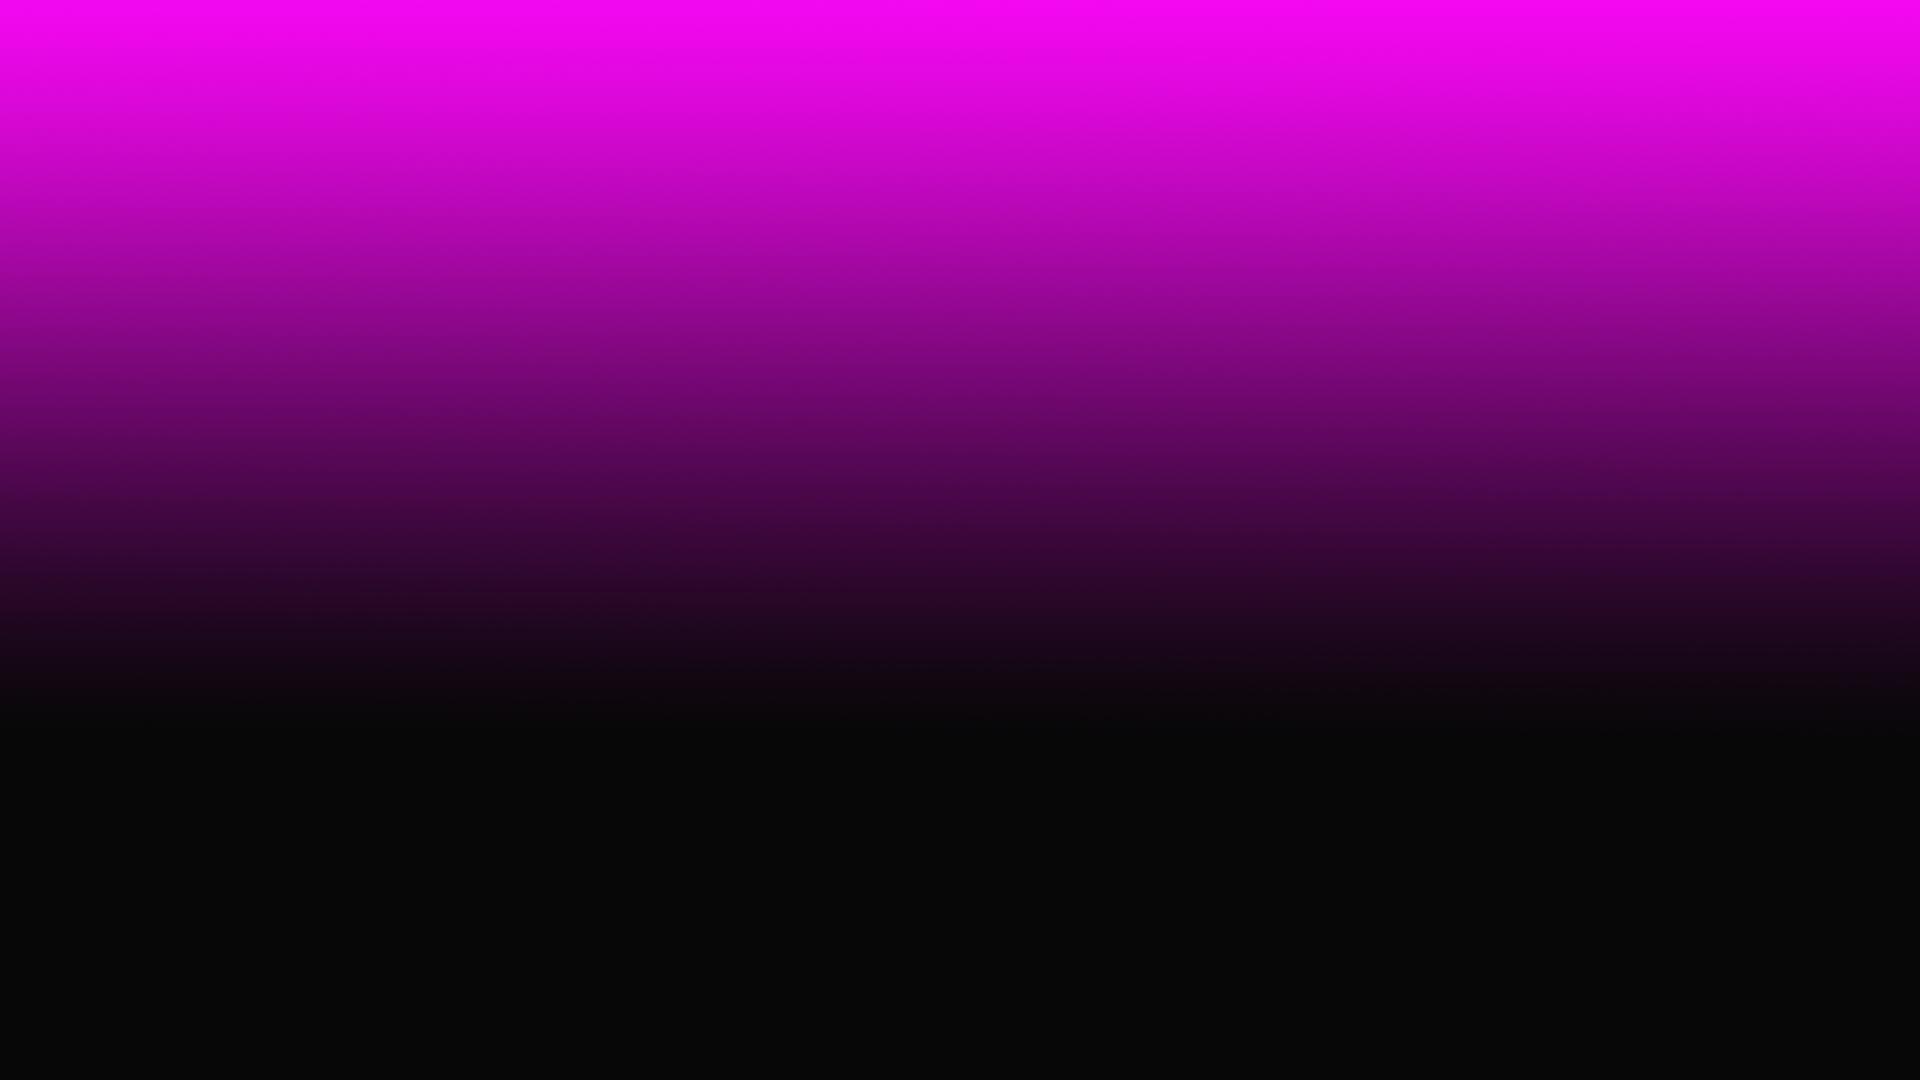 Black To Pink Gradient wallpaper   865927 1920x1080